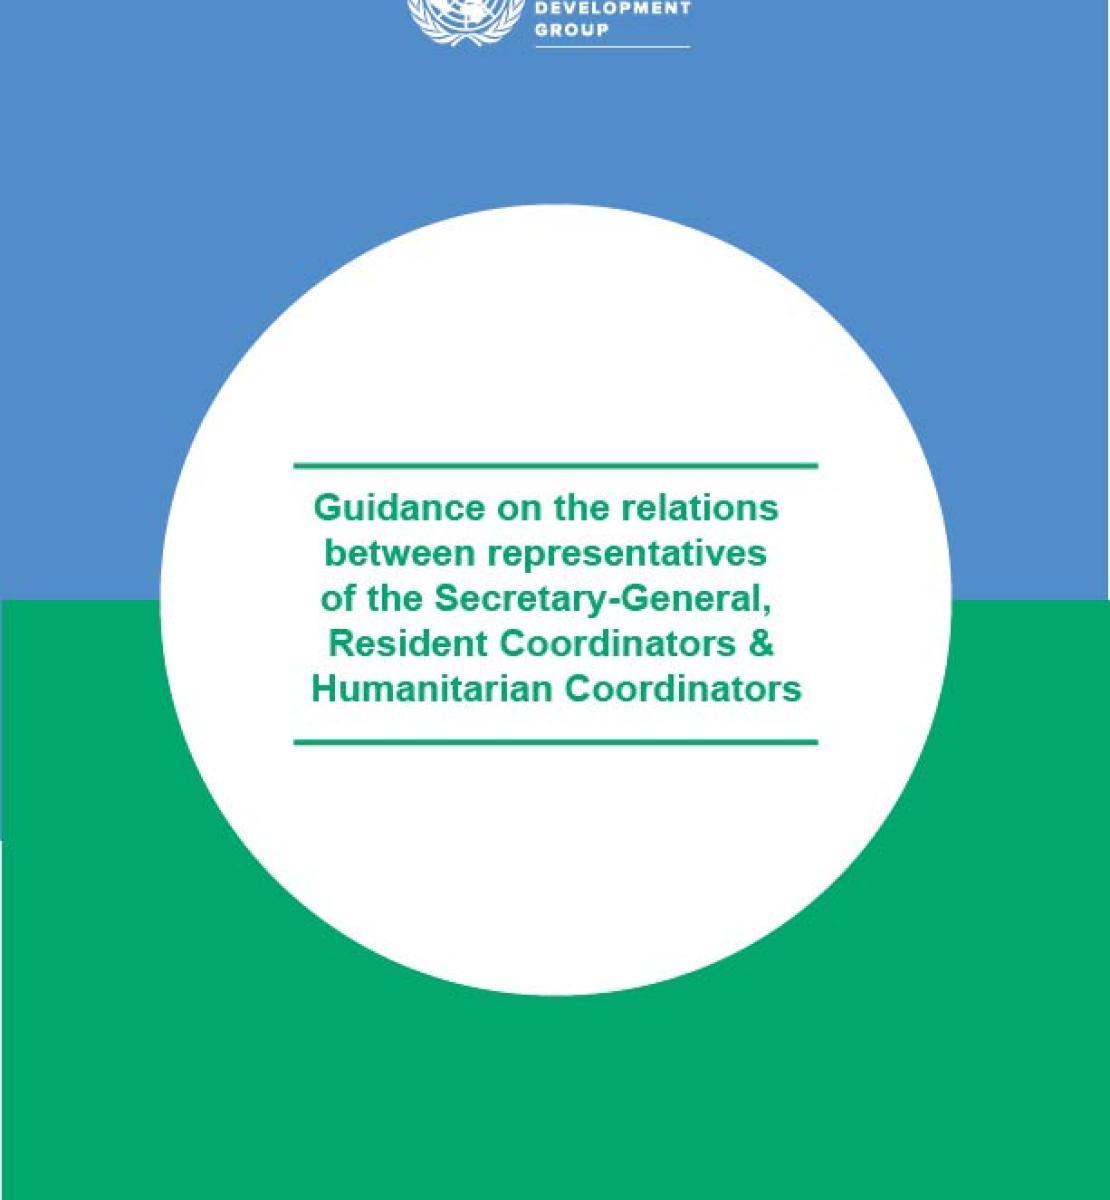 Guidance on the relations between representatives of the Secretary-General, Resident Coordinators and Humanitarian Coordinators